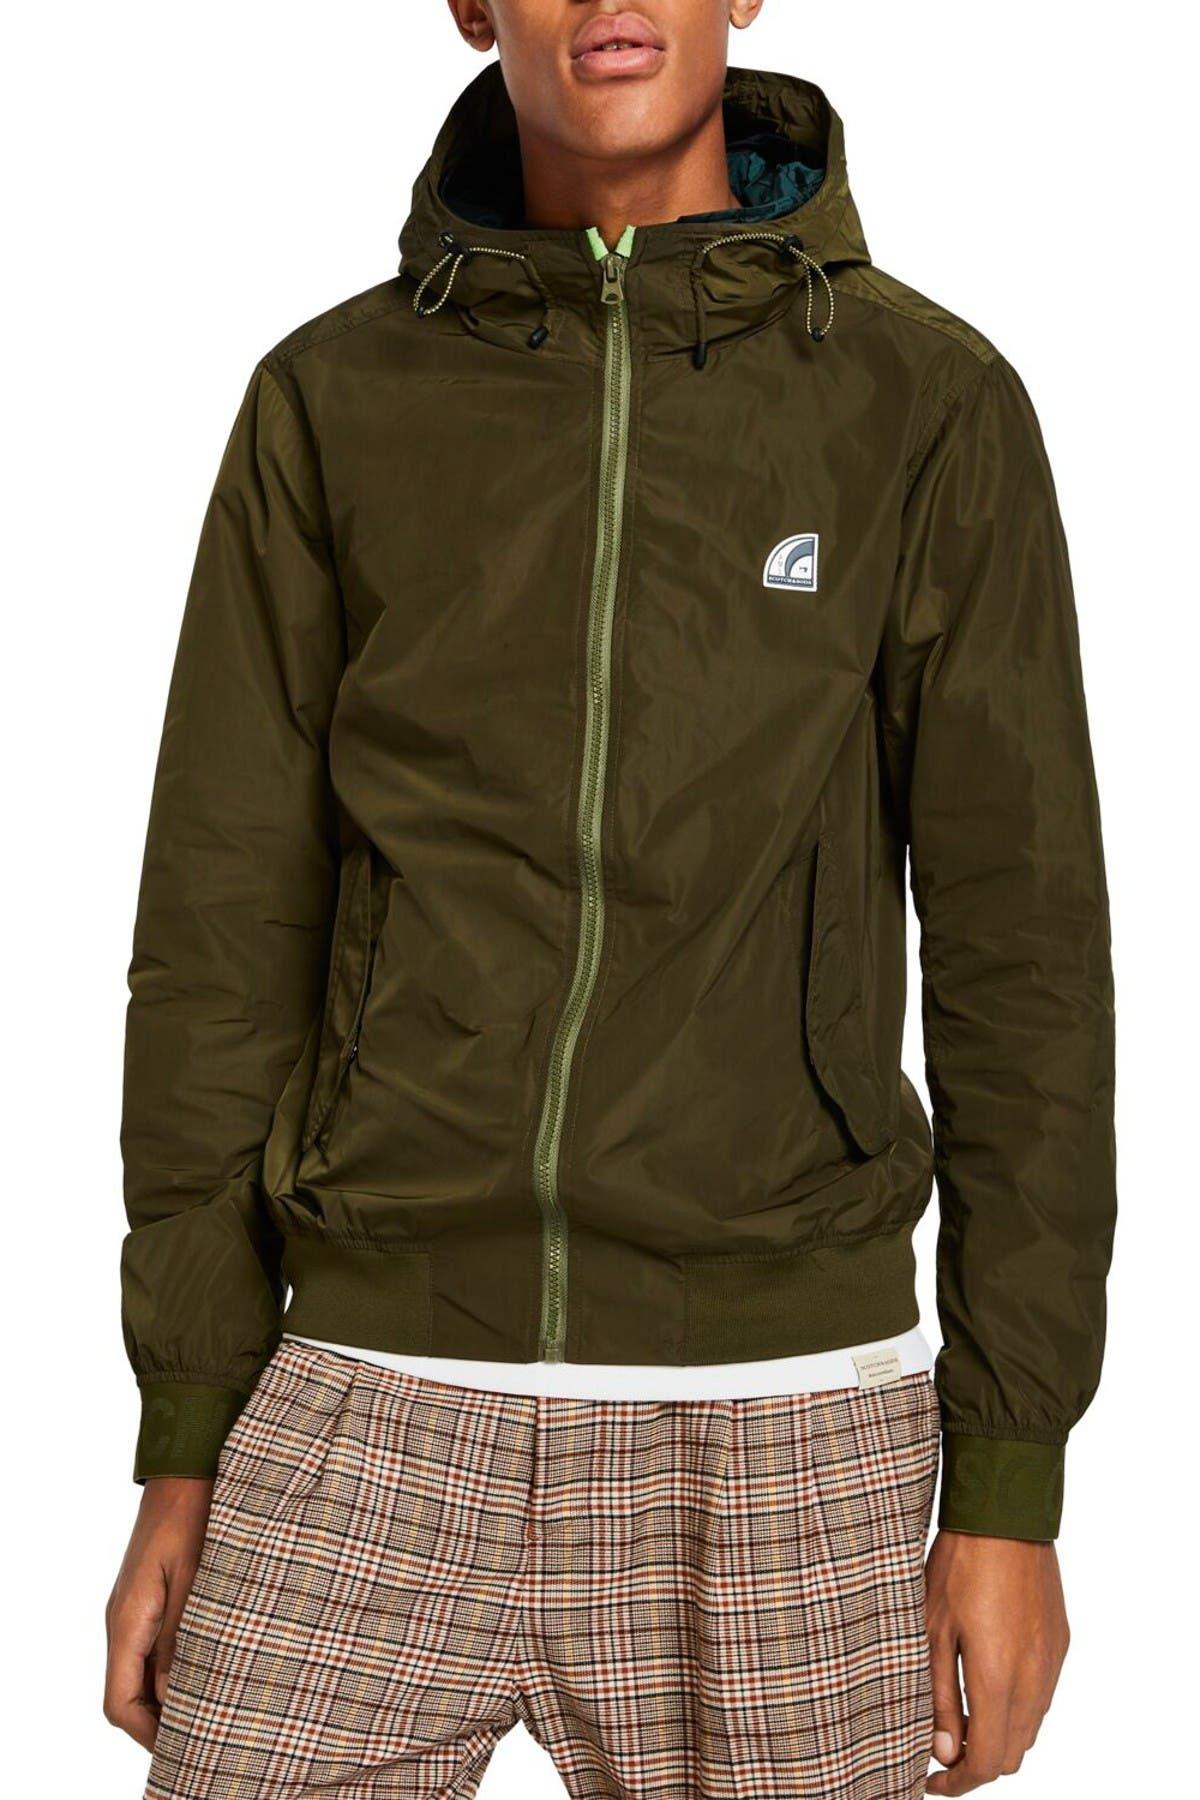 Image of Scotch & Soda Classic Hooded Jacket